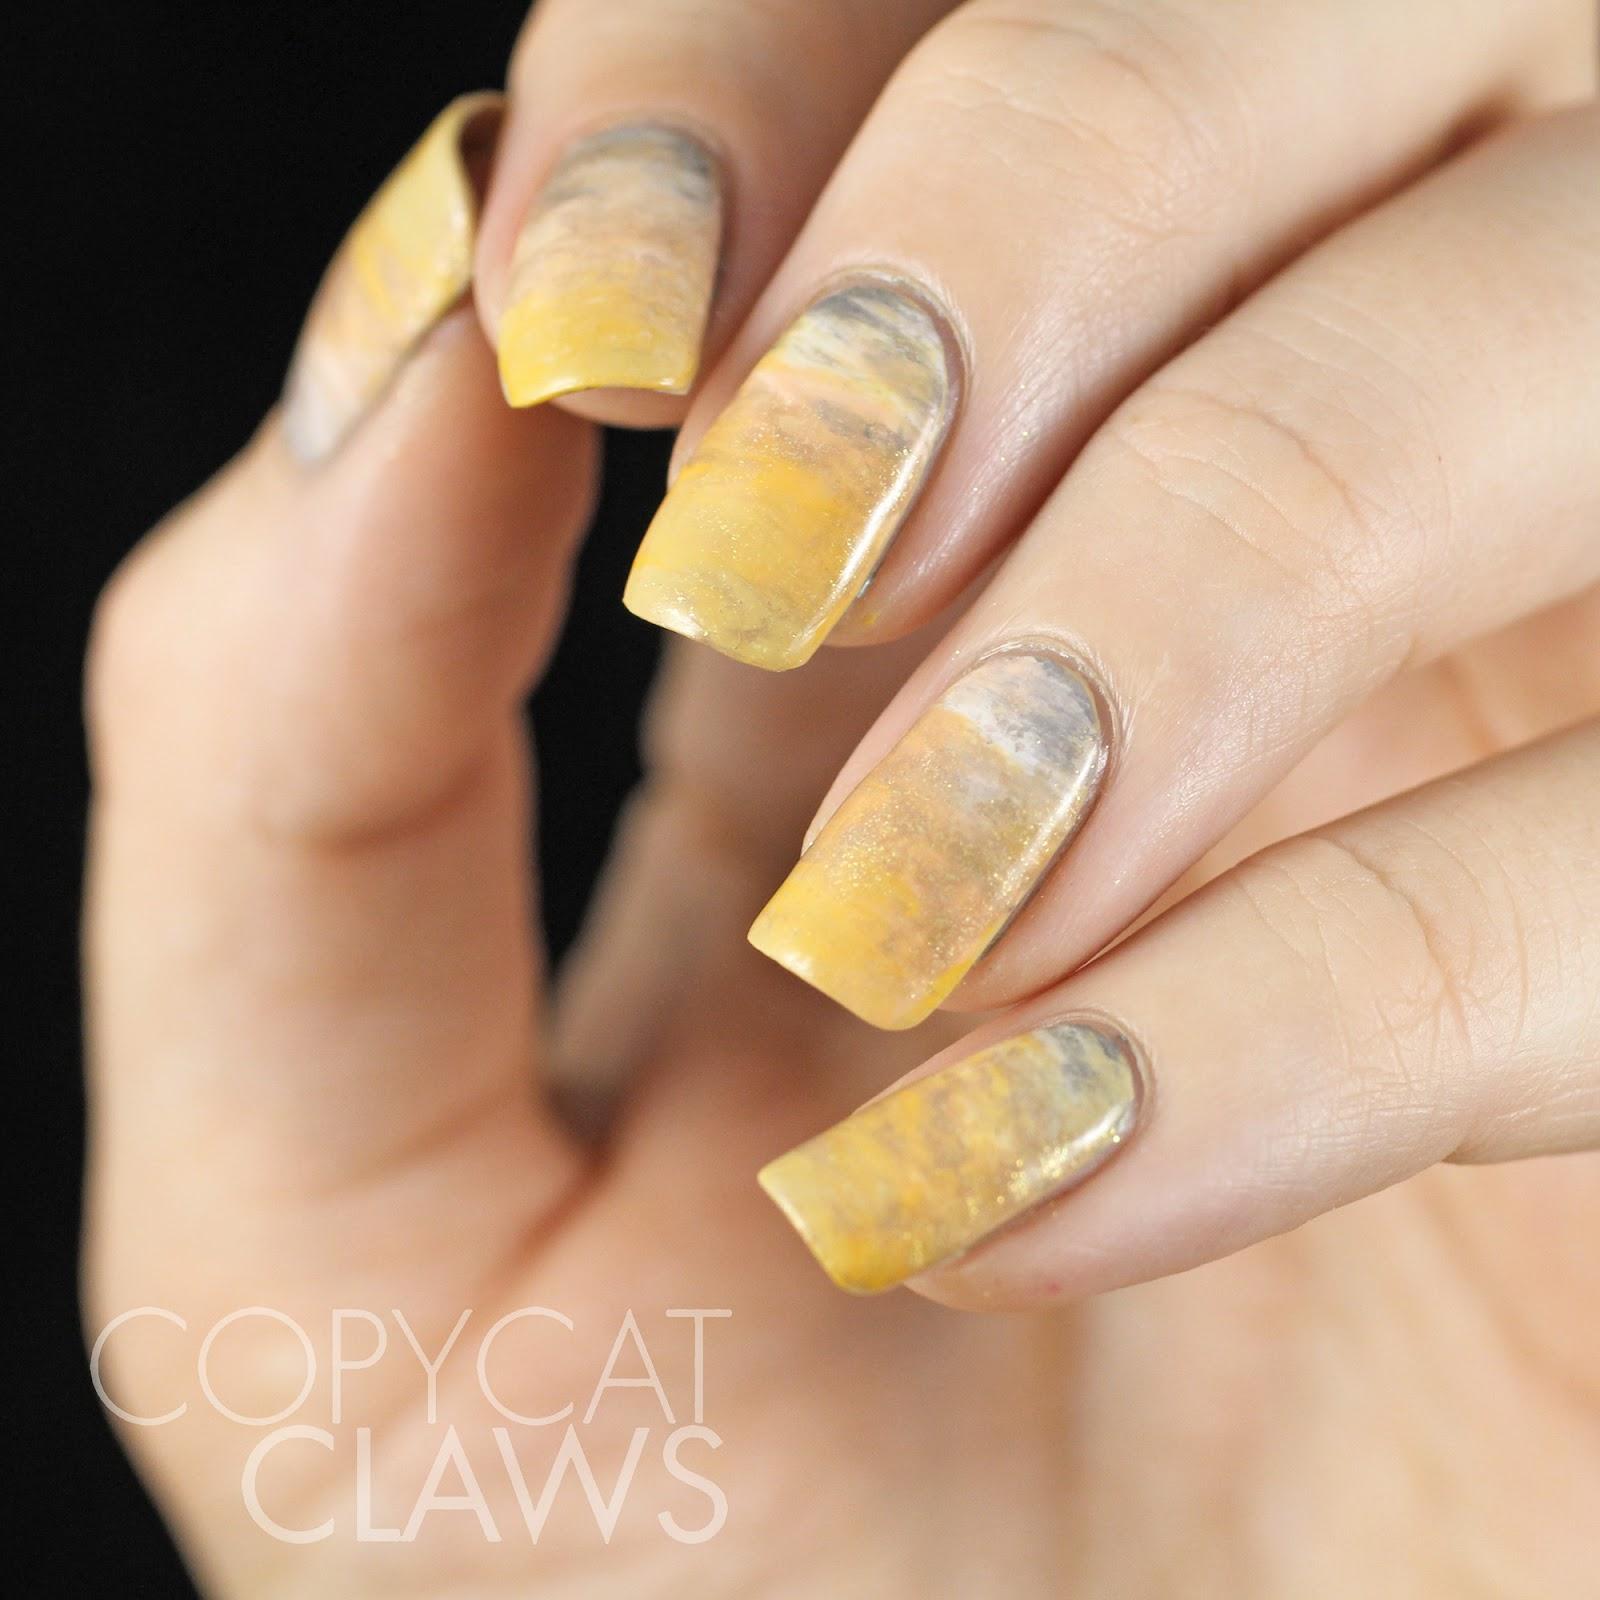 Copycat Claws: Sunday Stamping - Wildlife Nail Art